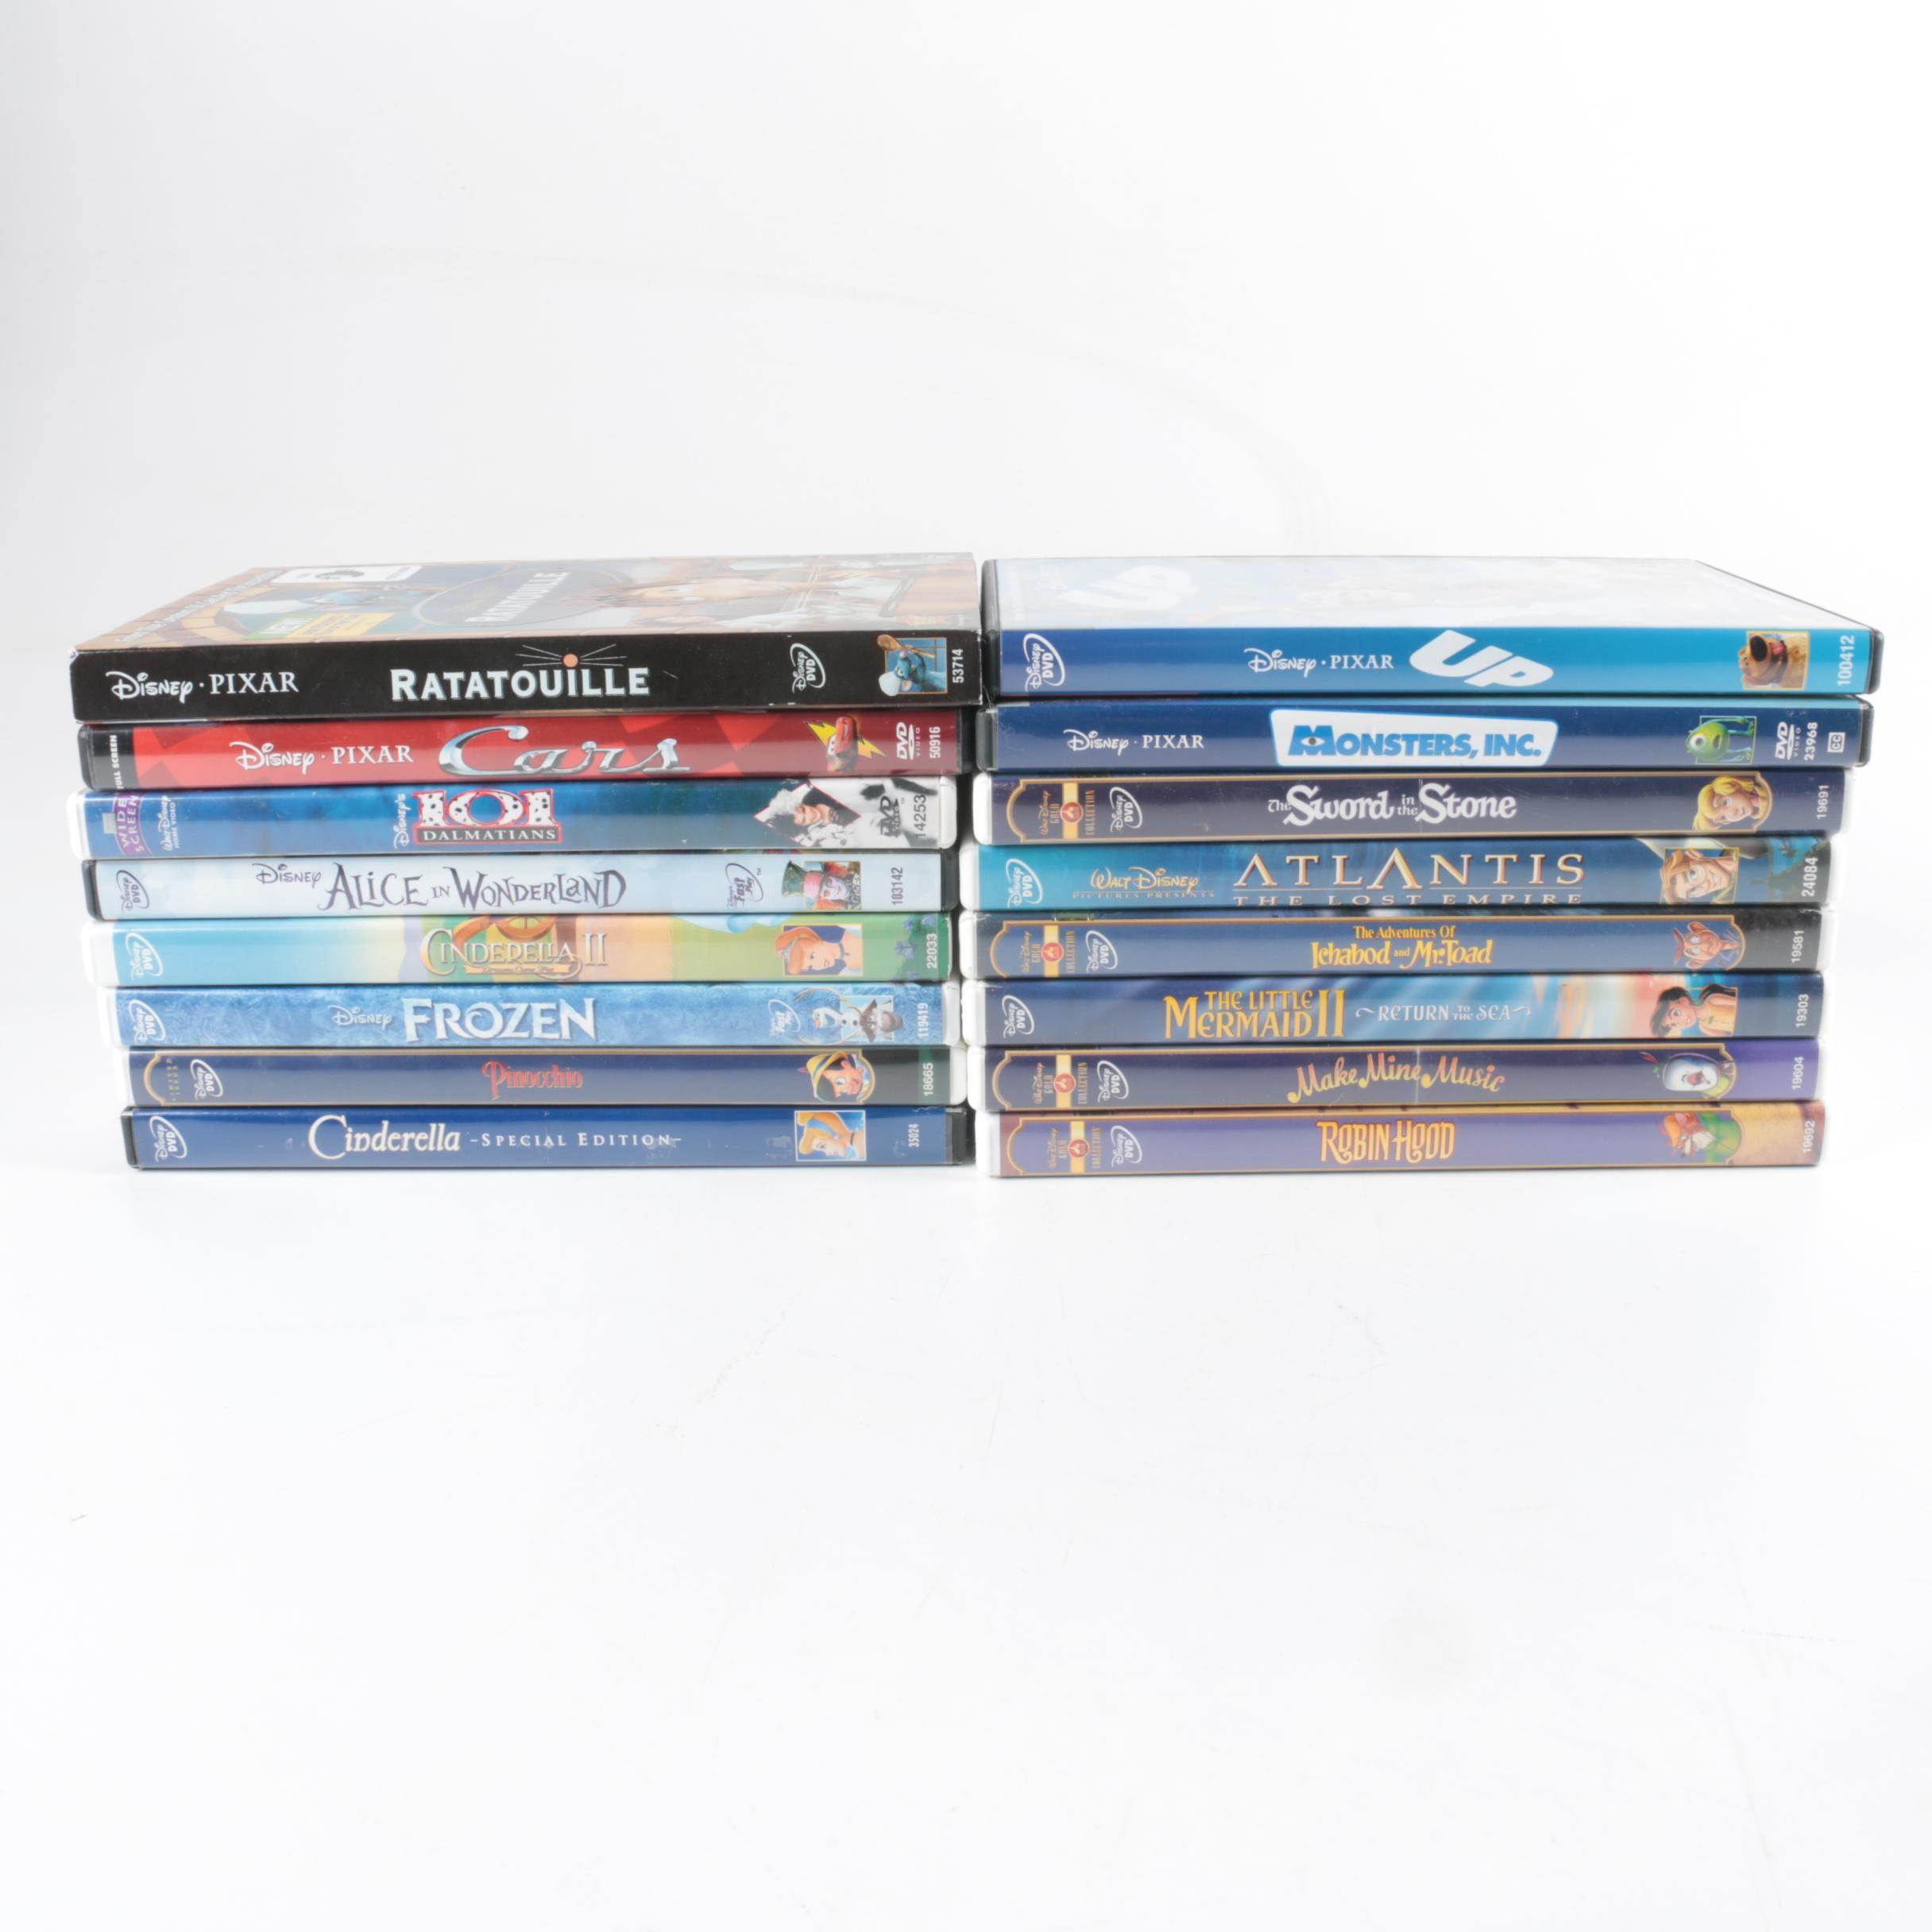 Disney Animated Movie DVDs